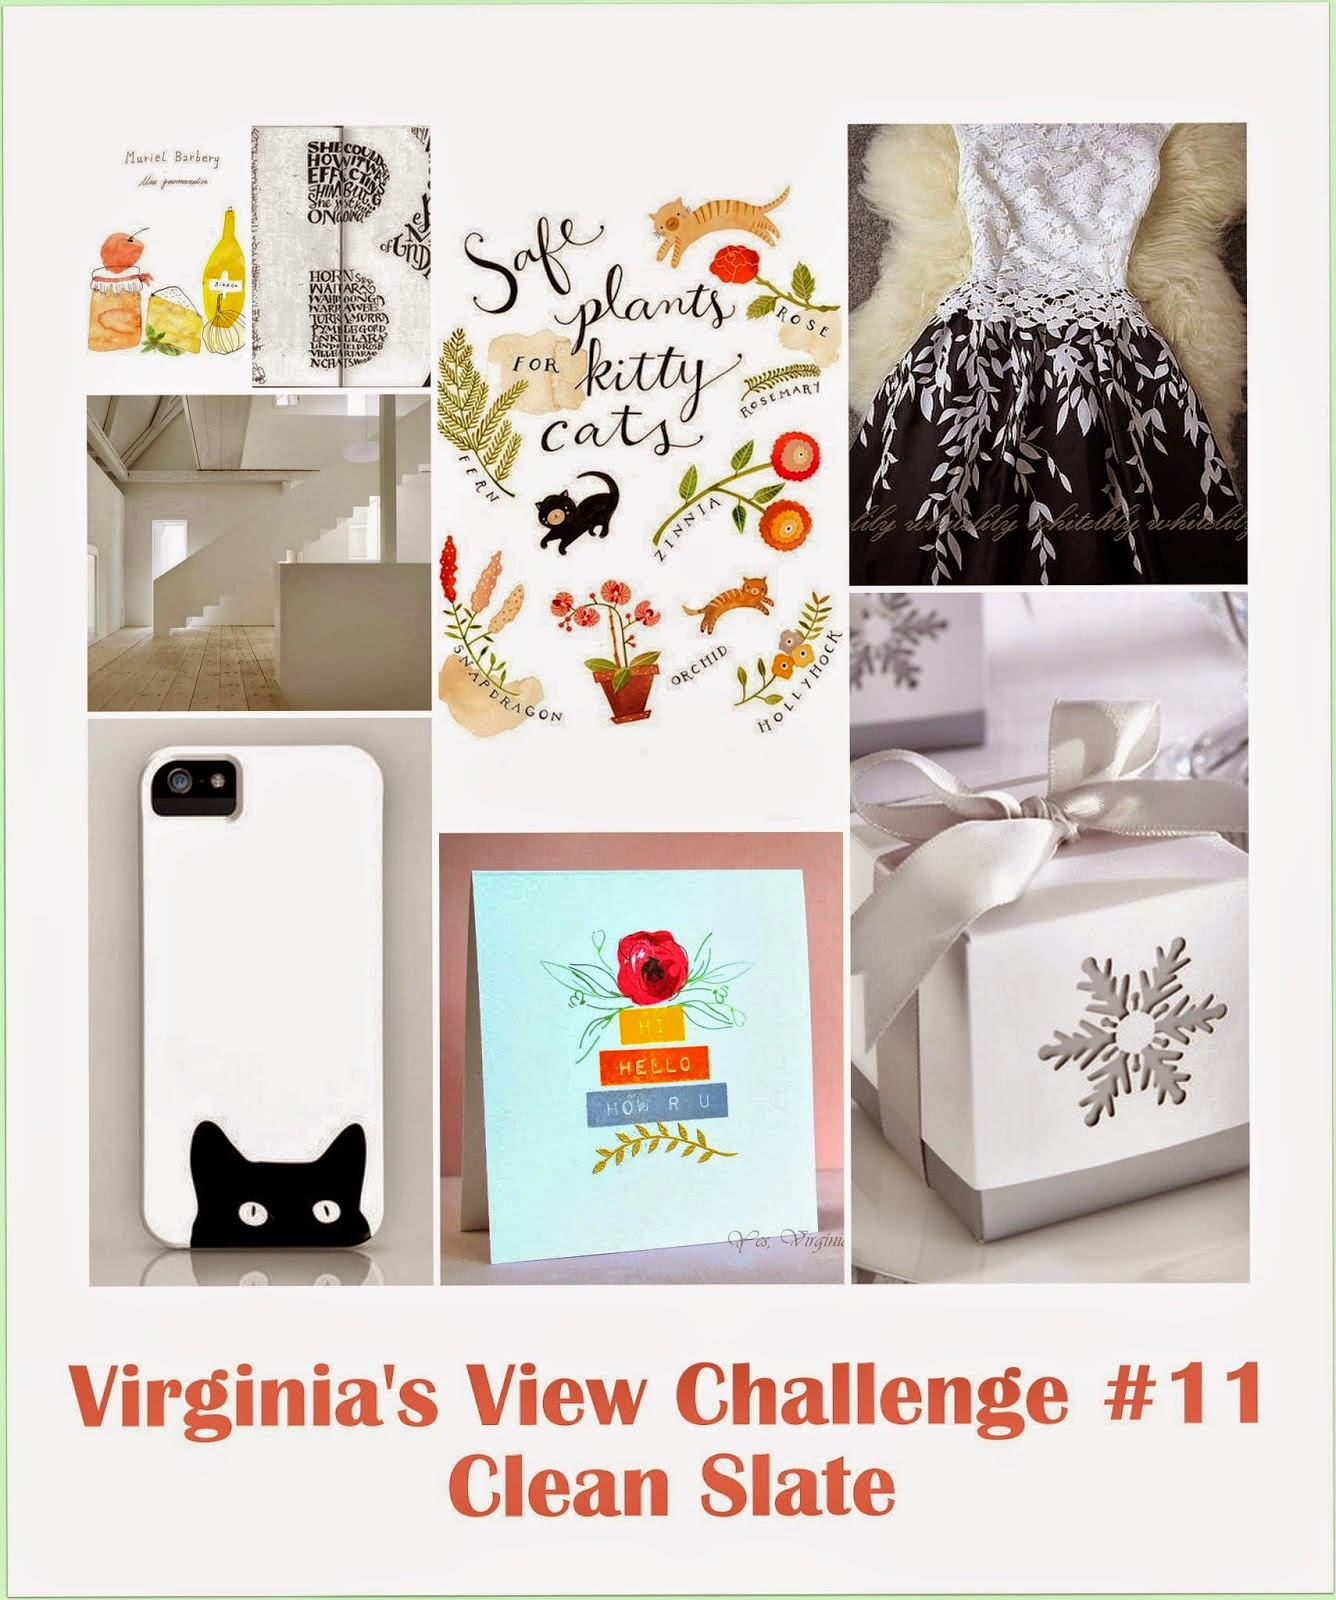 http://virginiasviewchallenge.blogspot.com.au/2015/01/virginias-view-challenge-11-clean-slate.html